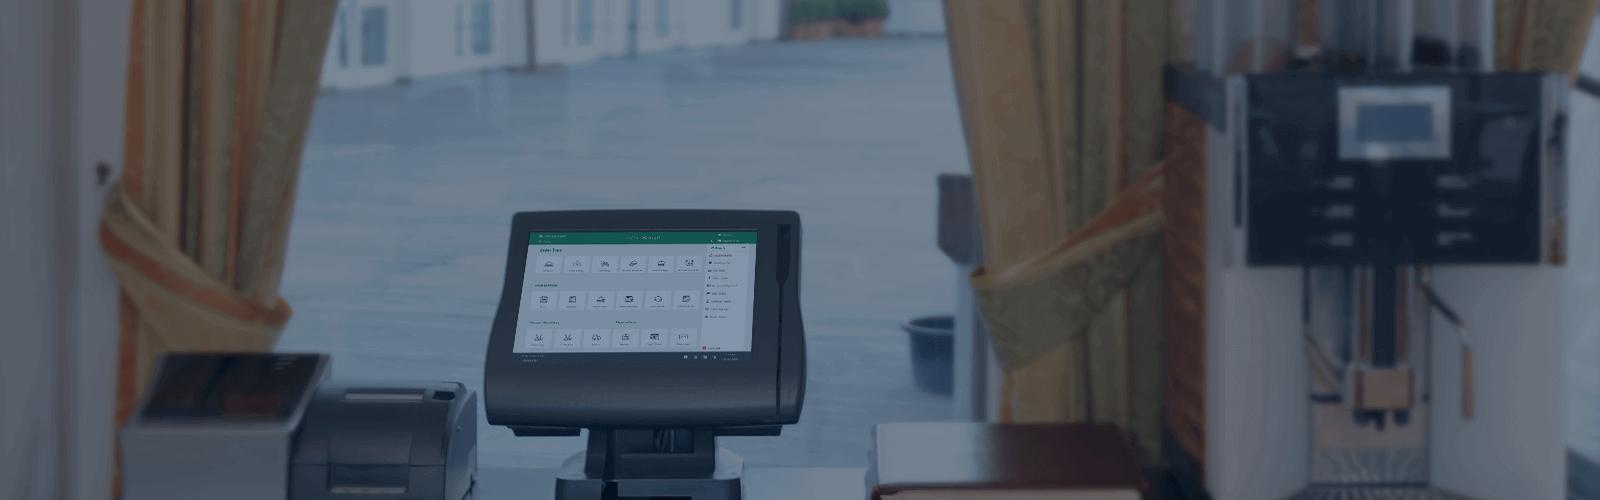 Restaurant Management System | POS Software - eZee BurrP!